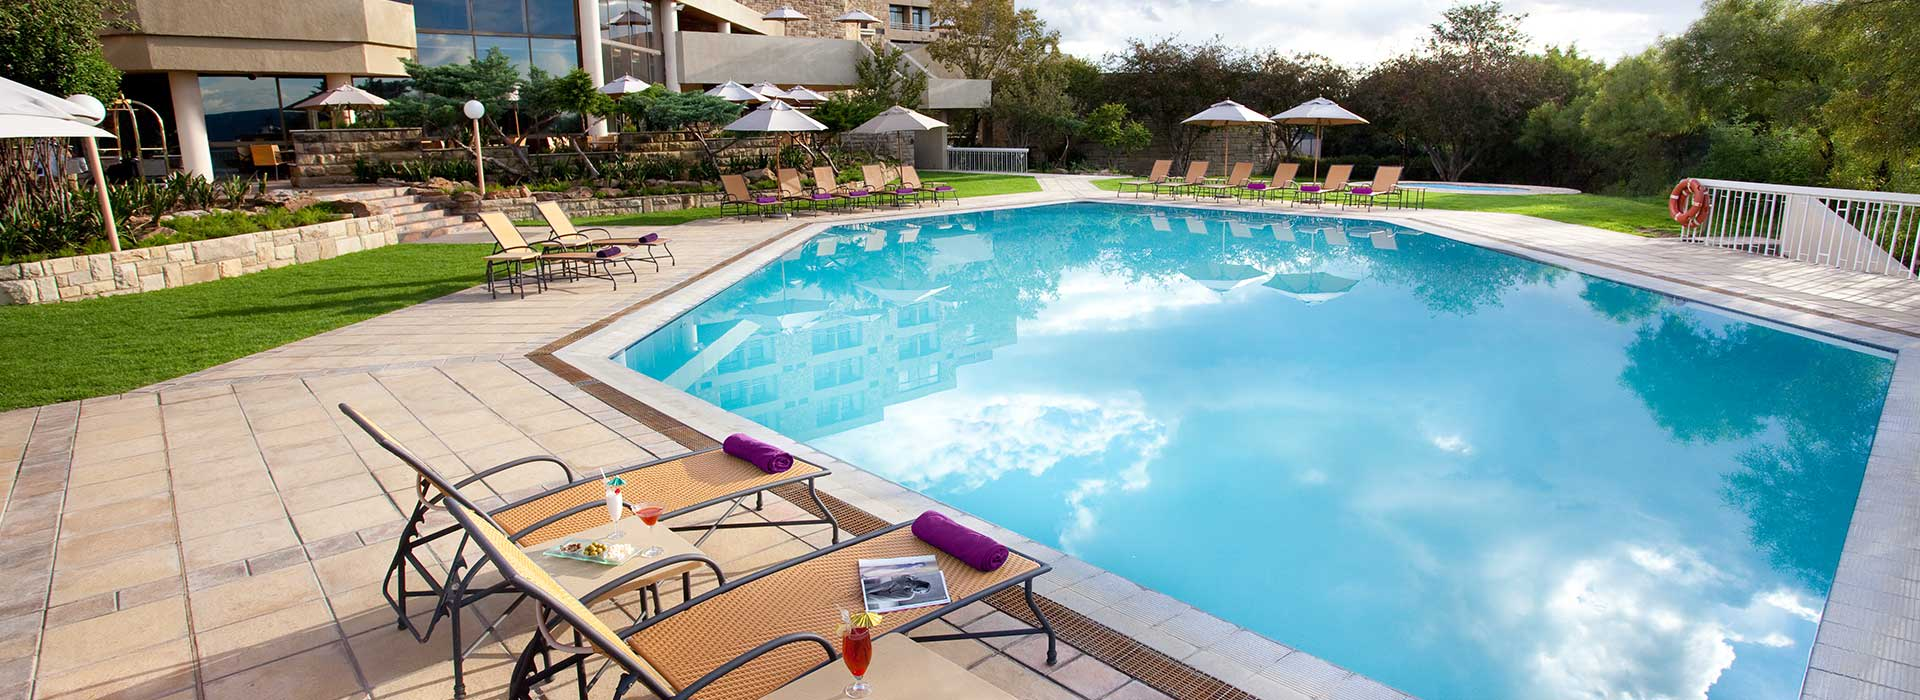 AVANI Lesotho Hotel pool deck